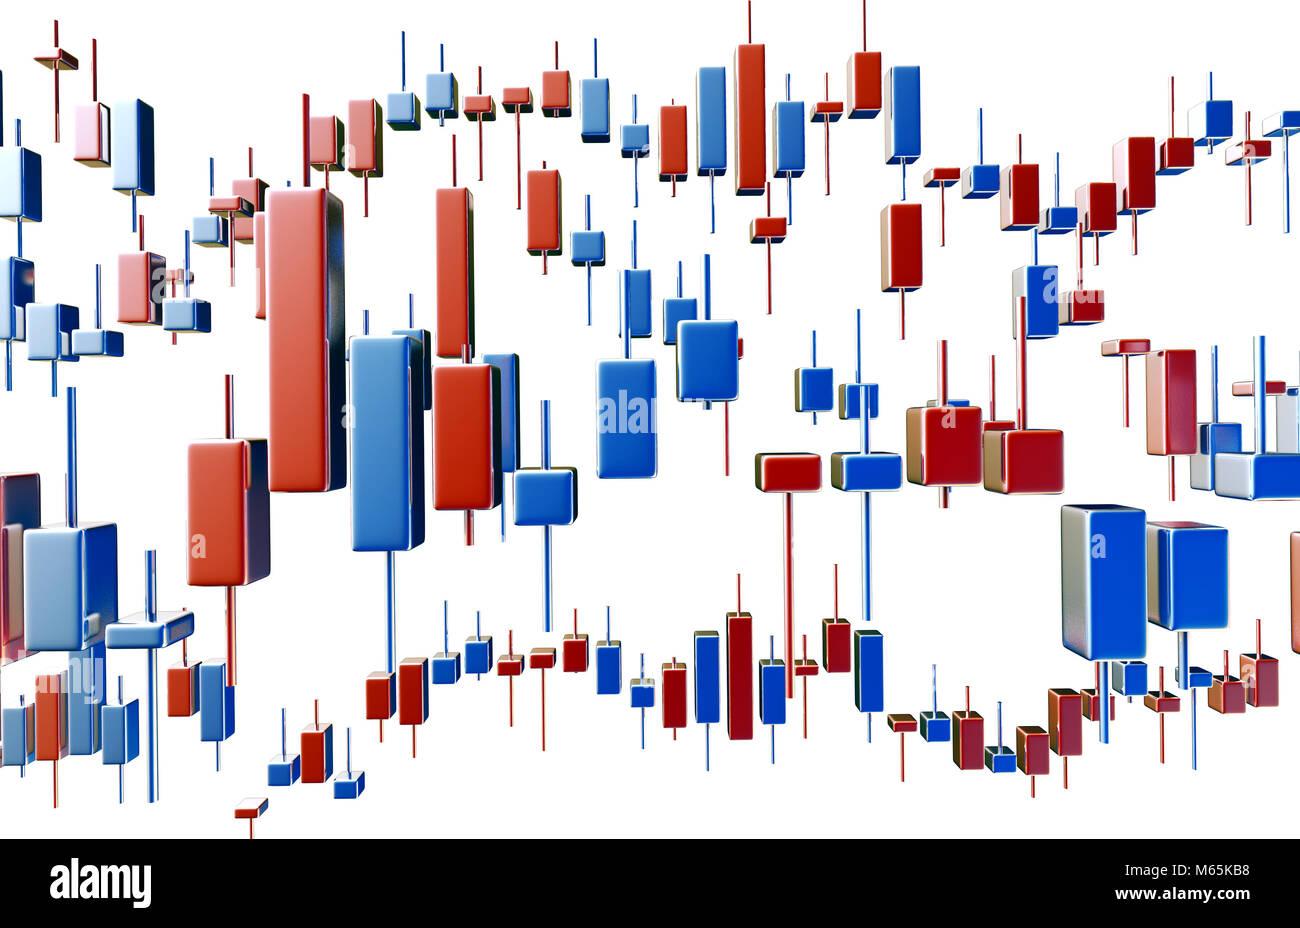 Stock market analysis data, trend charts, K chart Stock